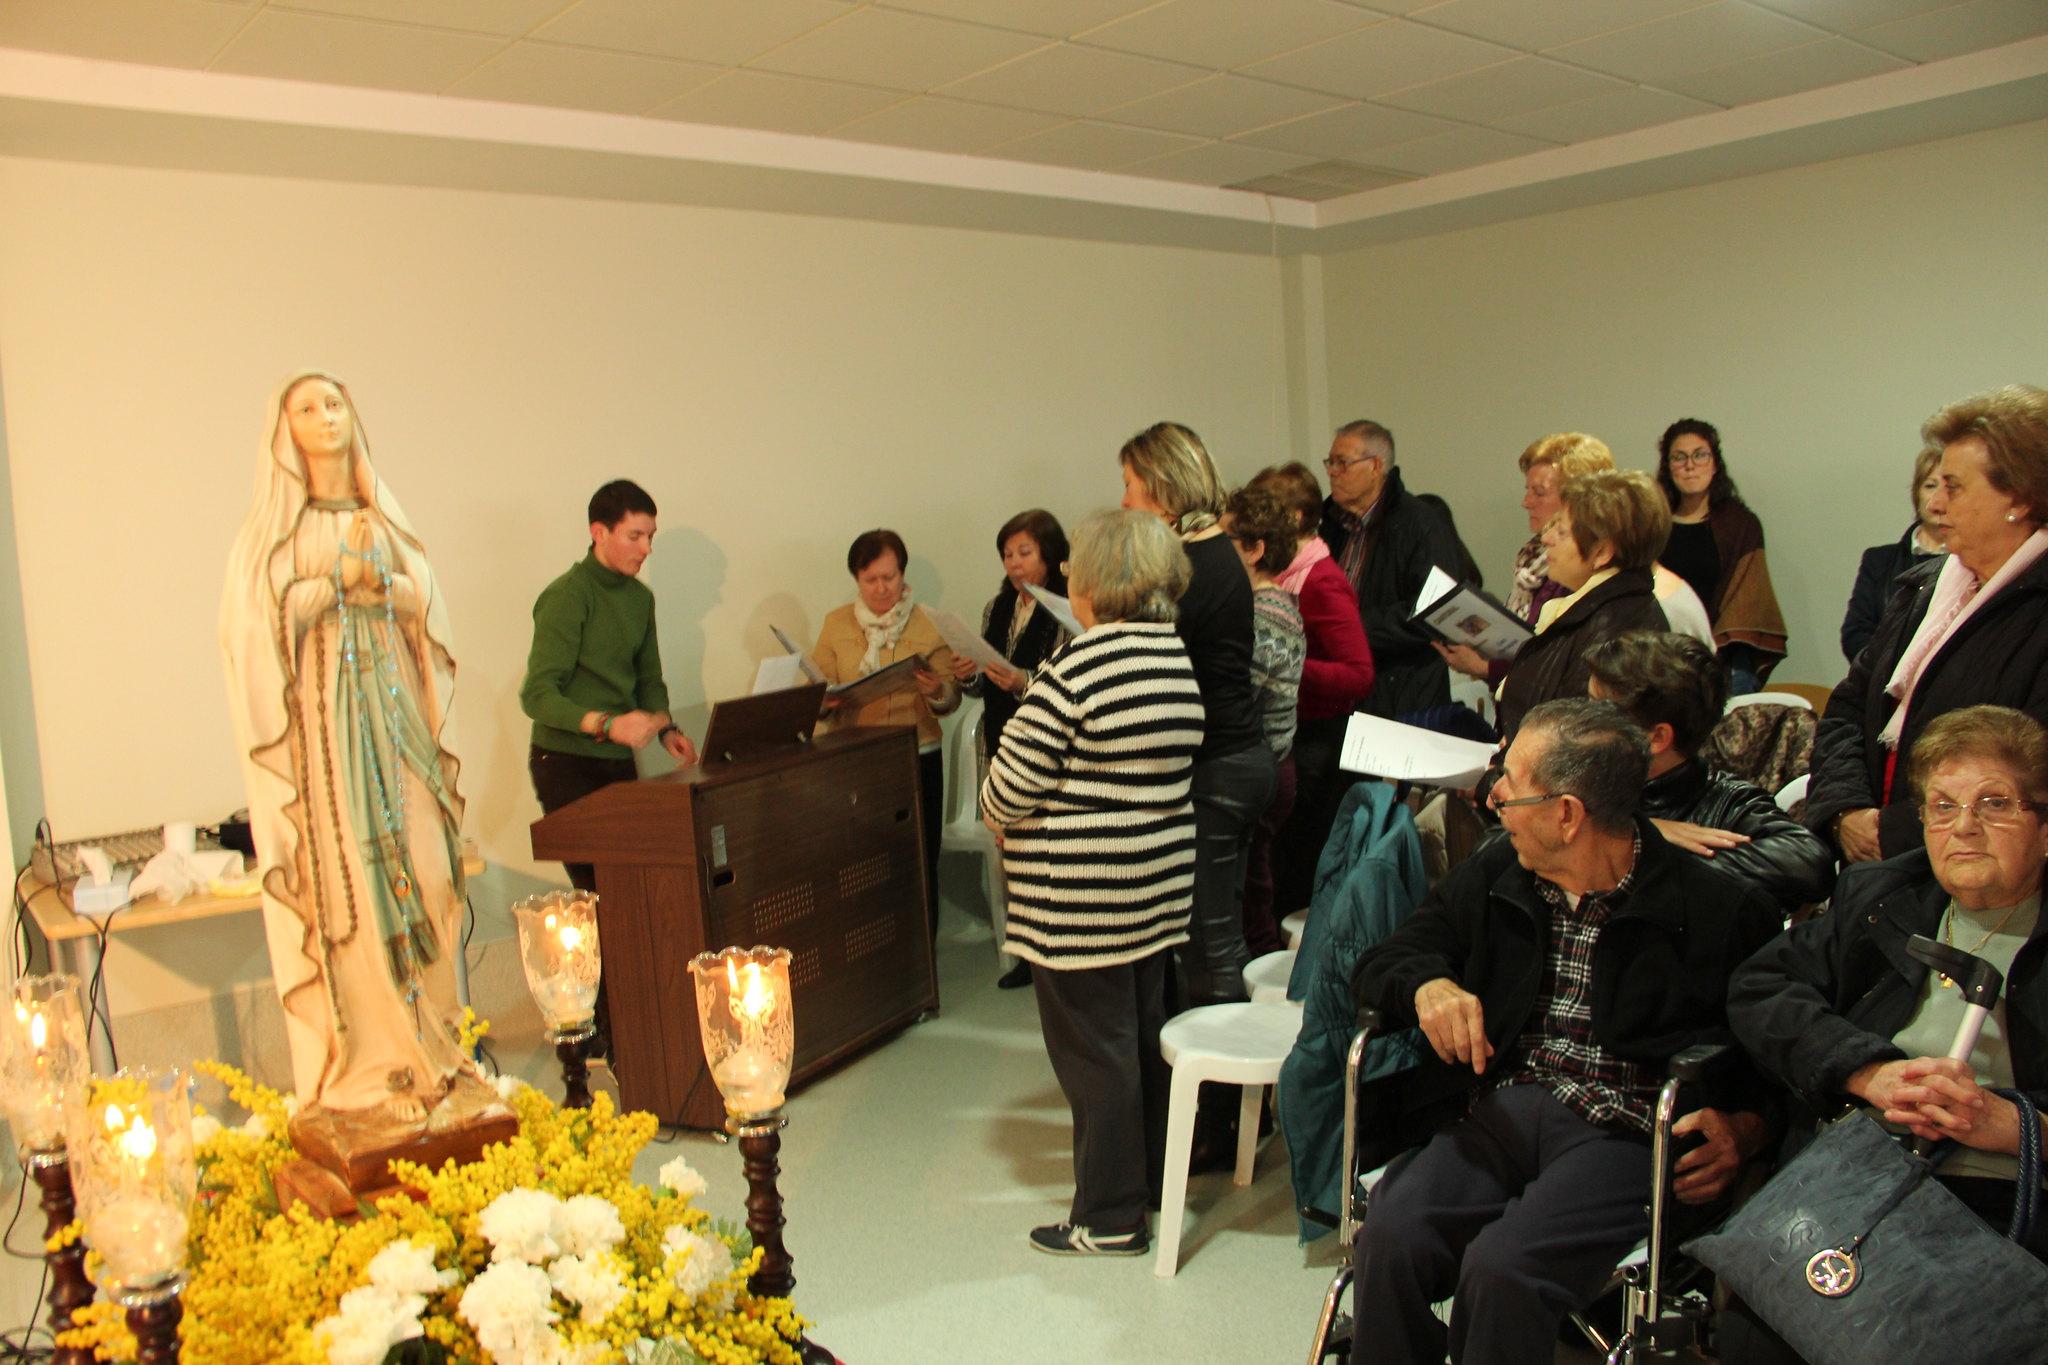 (2016-02-13) - Inauguración Virgen De Lourdes, La Molineta - Archivo La Molineta (015)